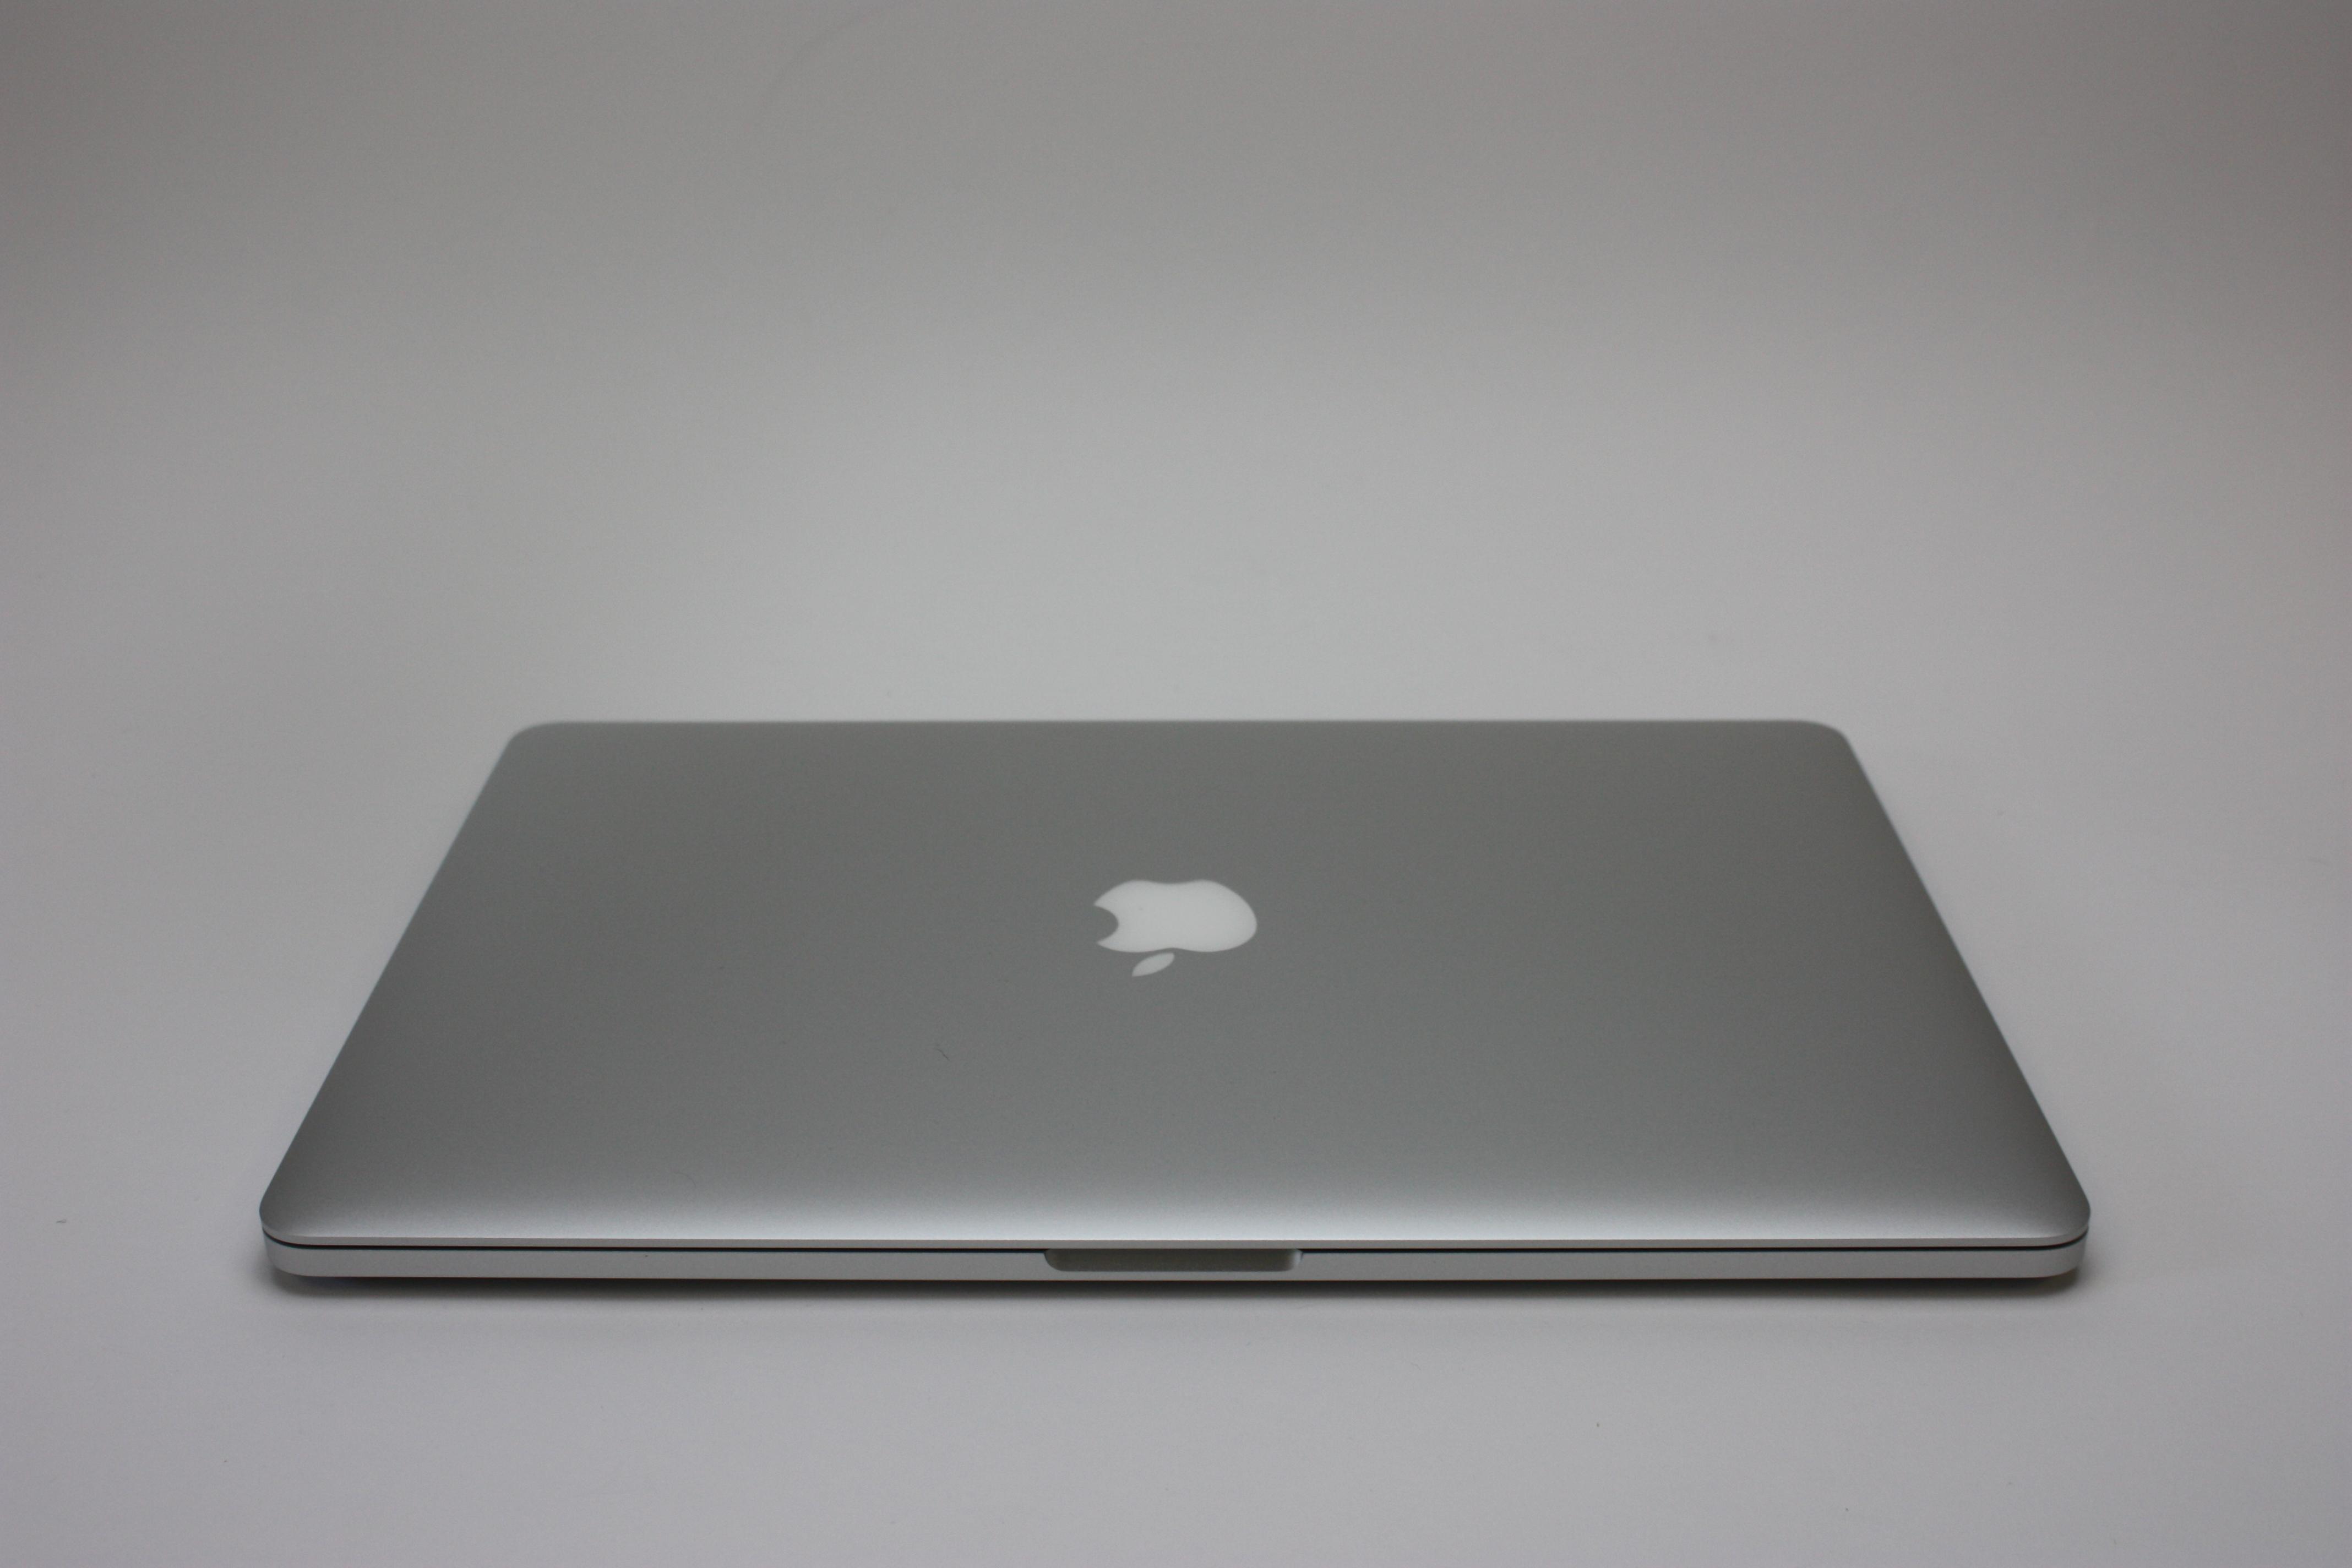 MacBook Pro 15-inch Retina, 2.2 GHz Intel Core i7, 16 GB 1600 MHz DDR3, 256 GB Flash Storage, image 4